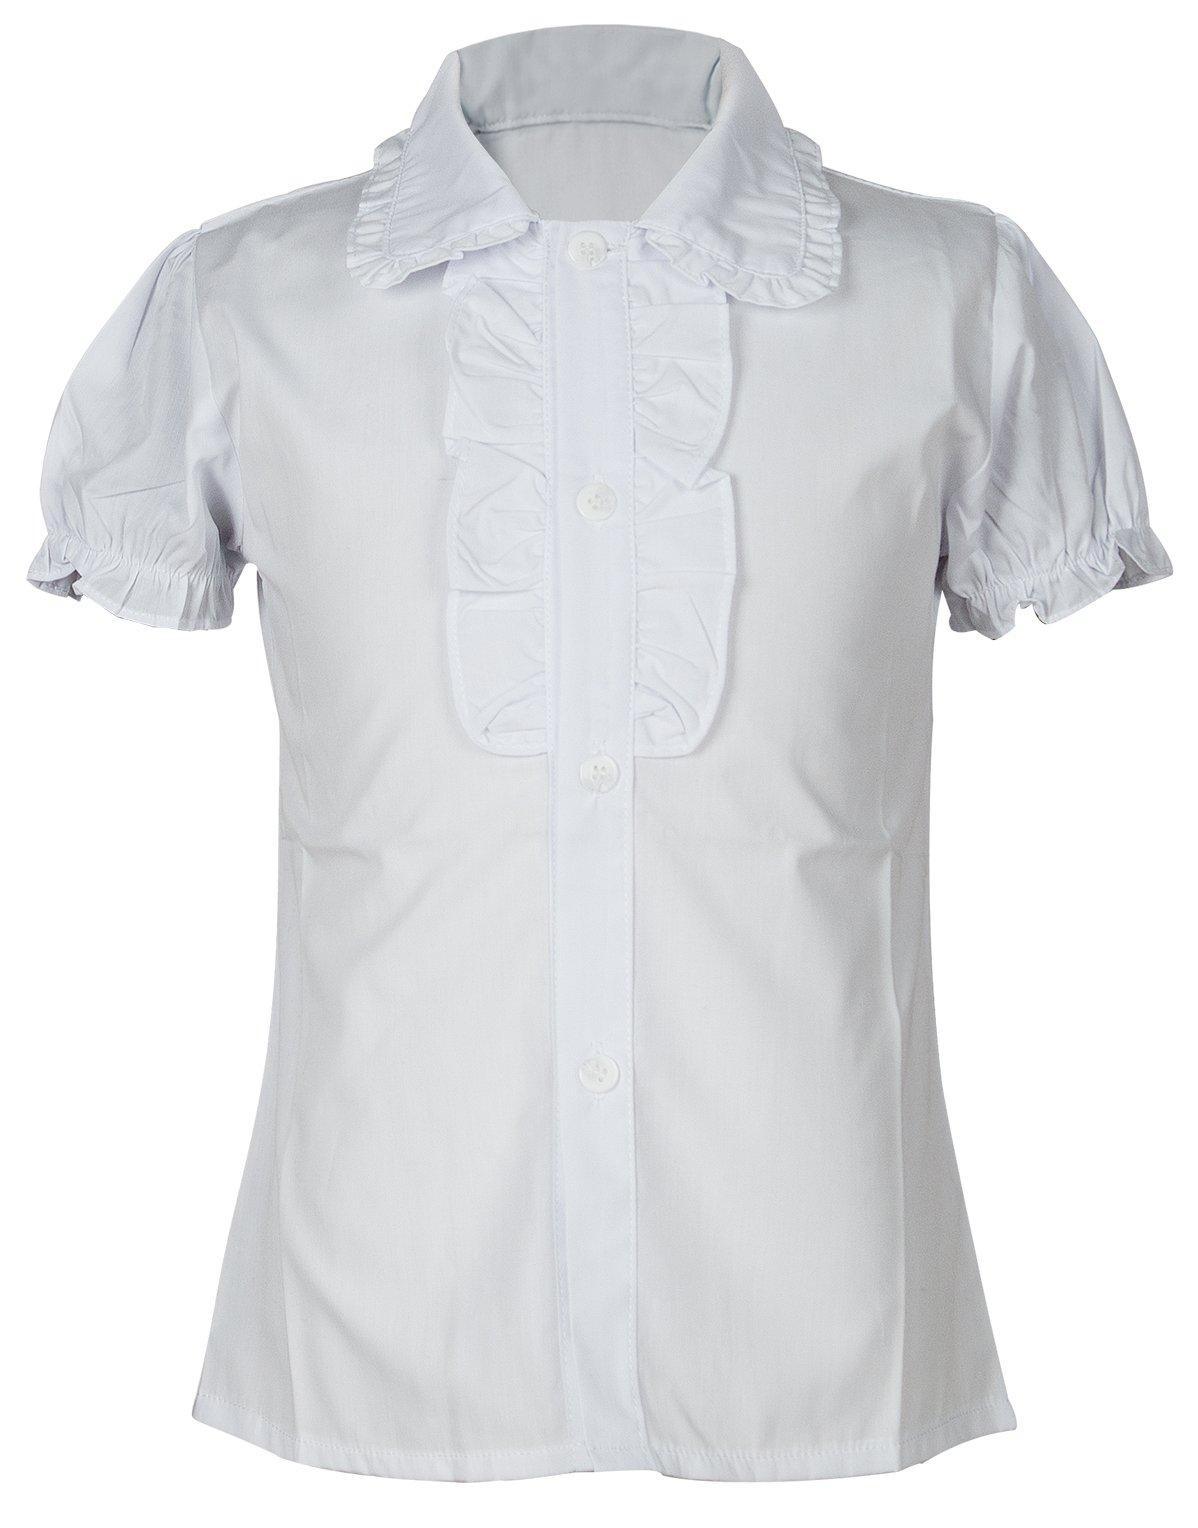 Big Girl's School Uniforms Short Puff Sleeve Blouse Button-Down Shirts with Ruffle Trim 10